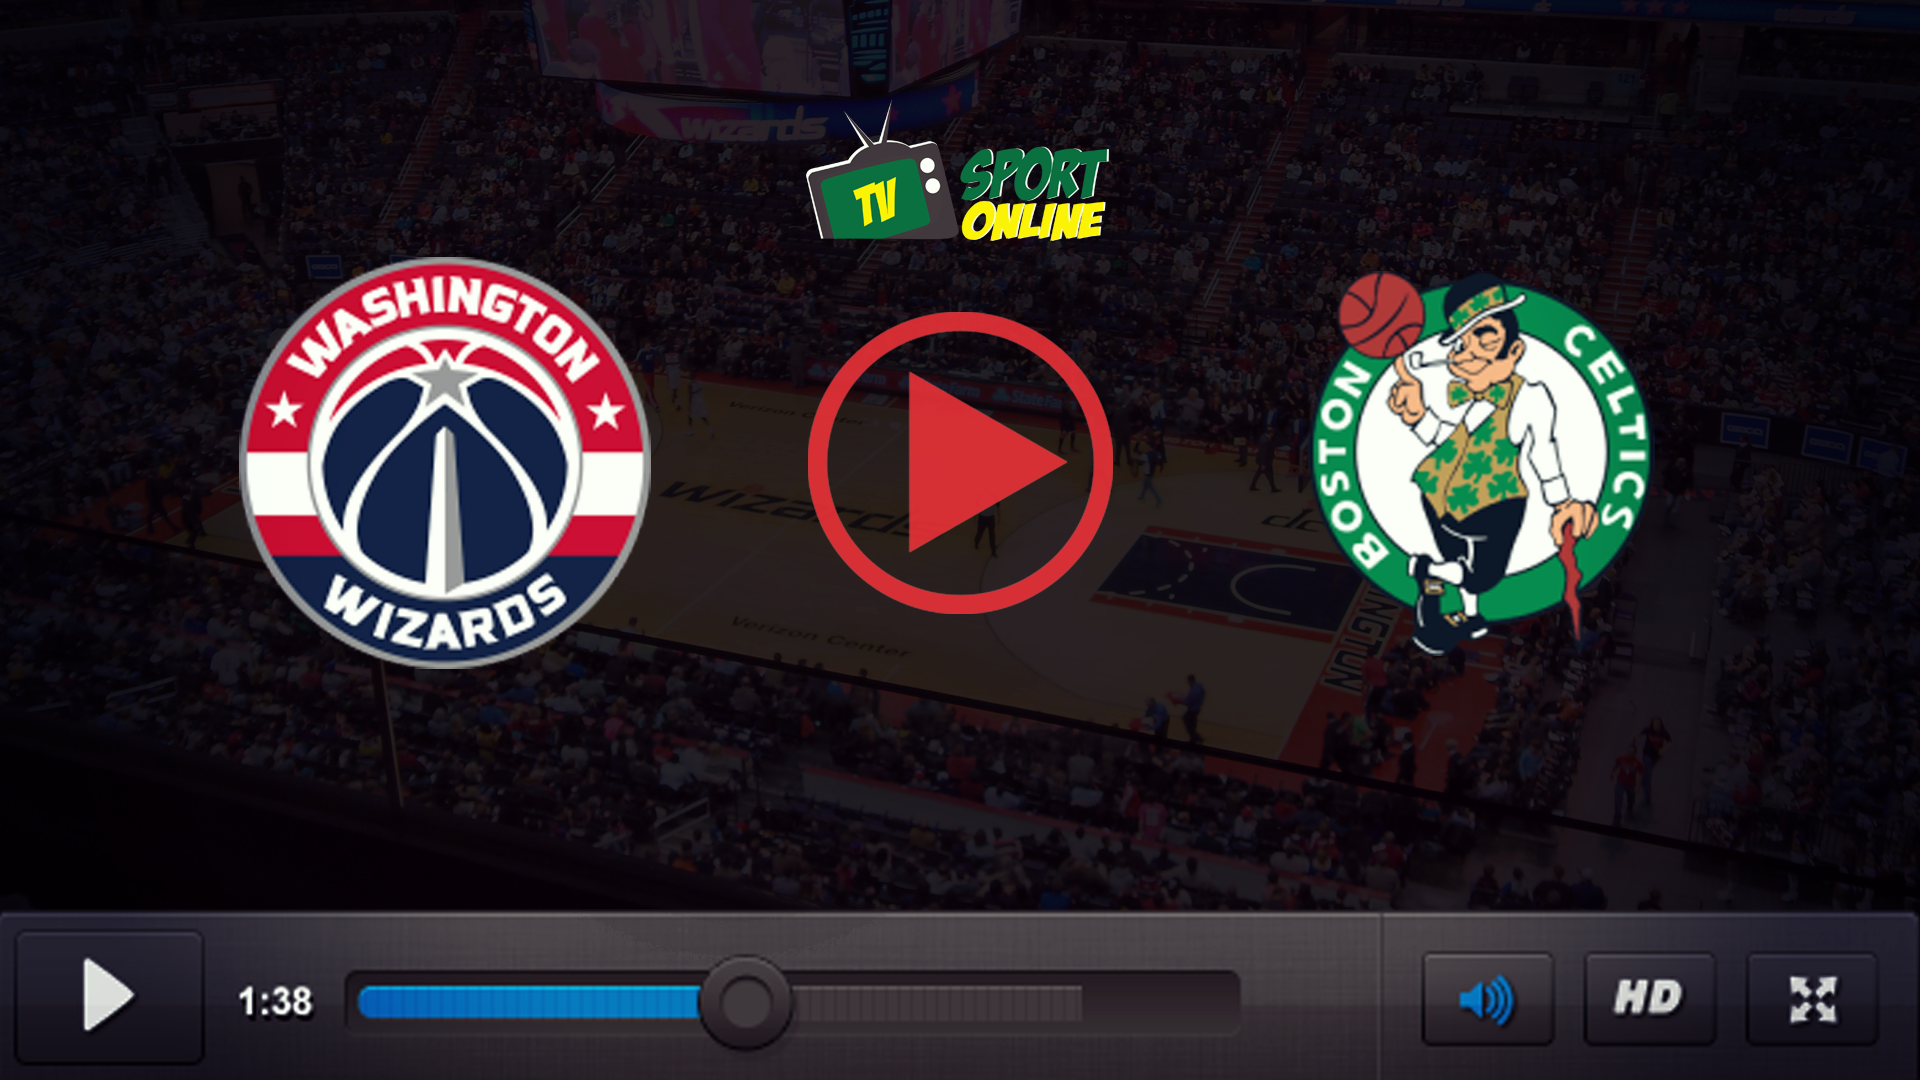 Watch Live Stream Washington Wizards – Boston Celtics